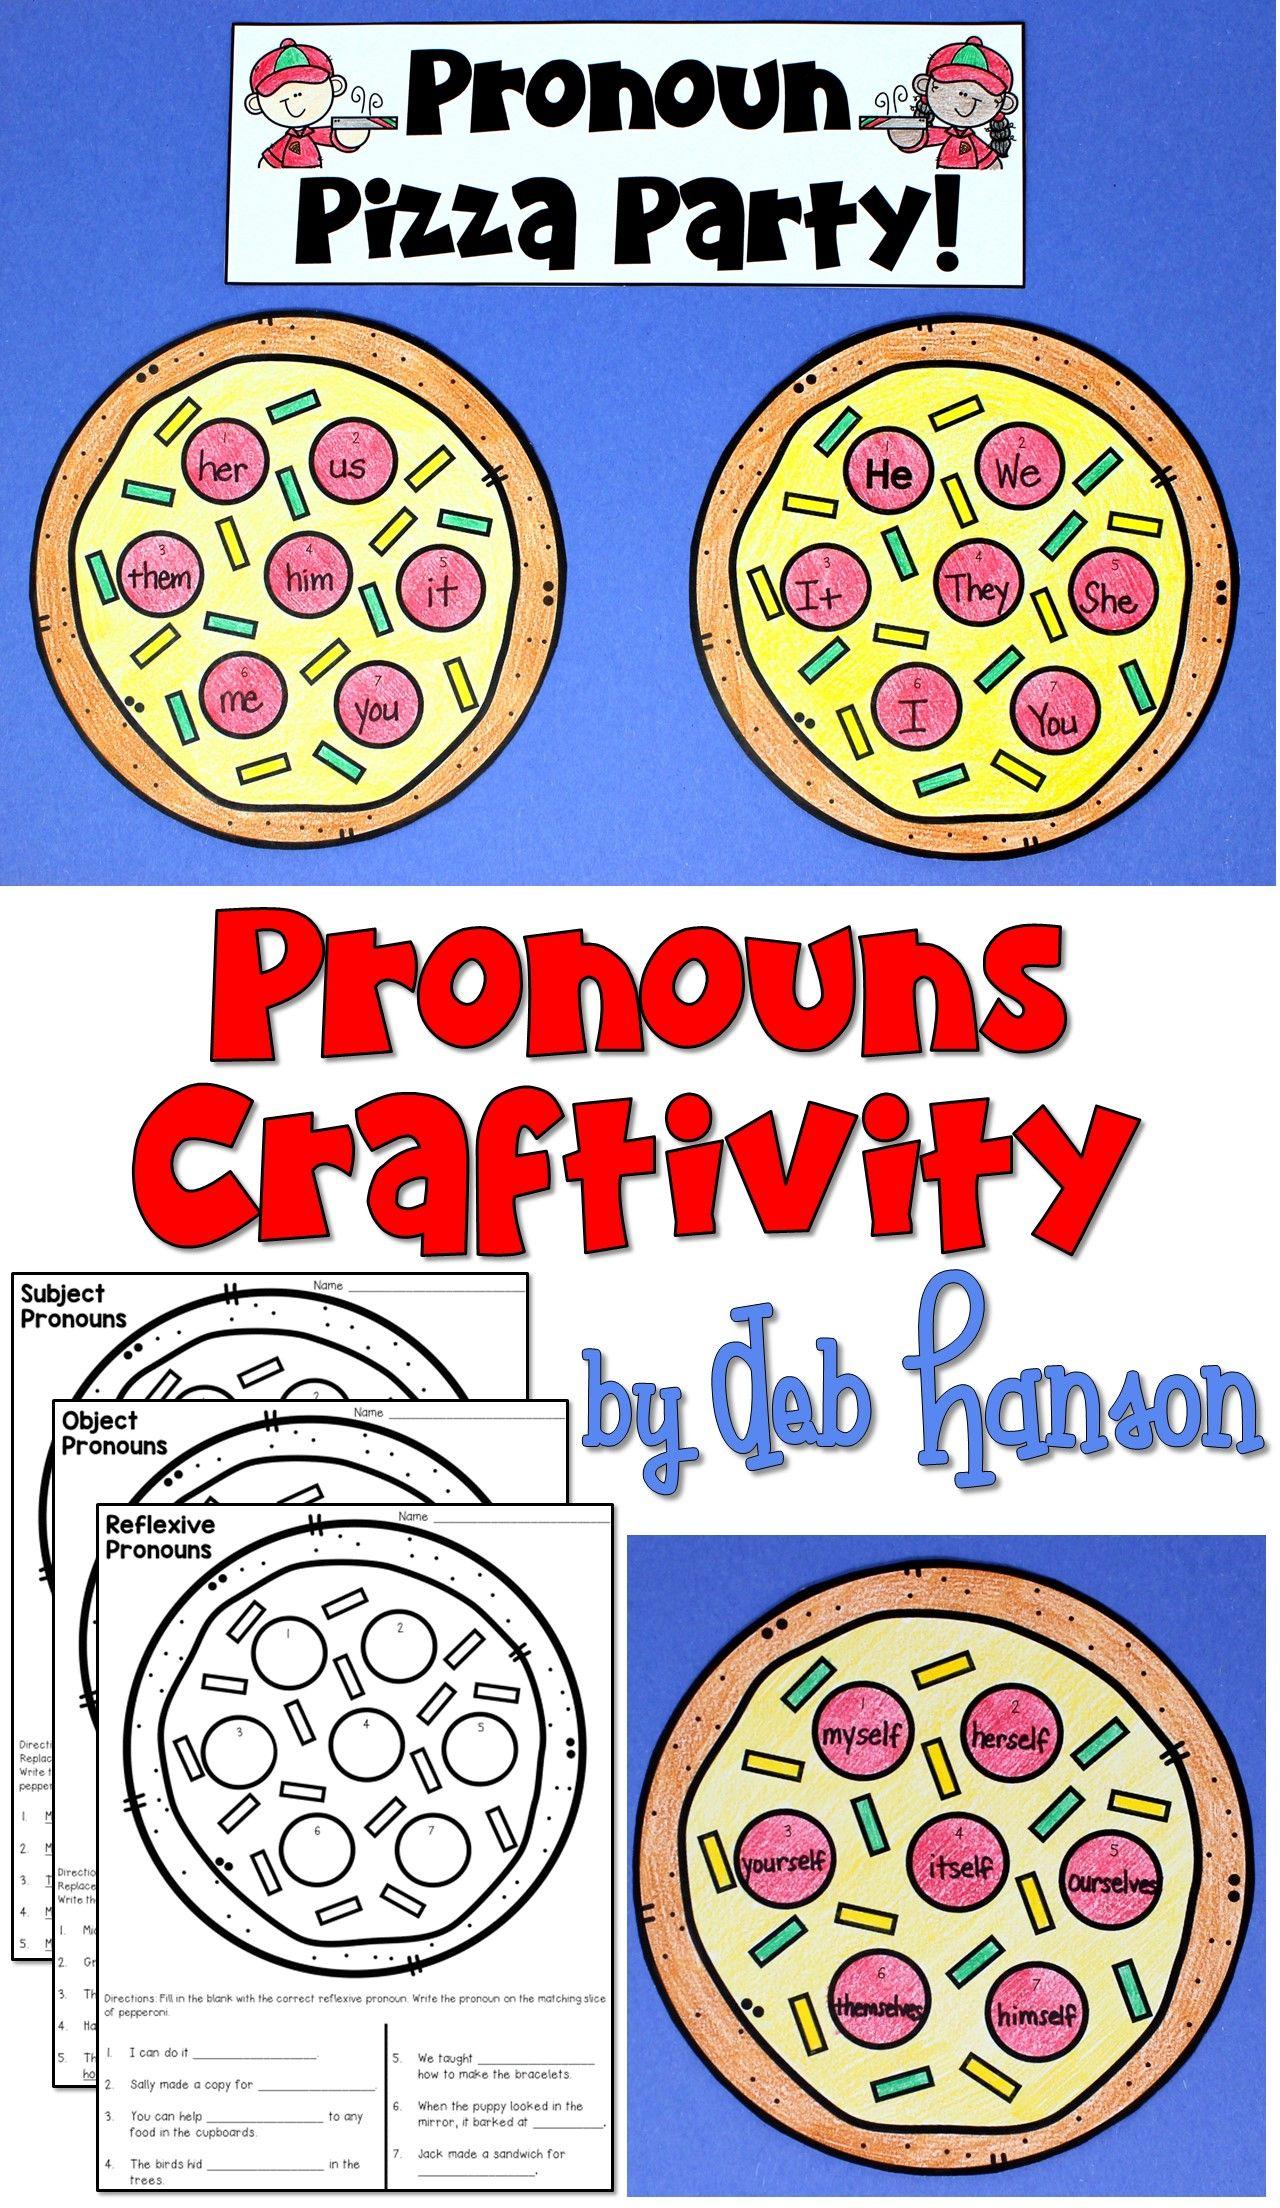 Pronouns Craftivity